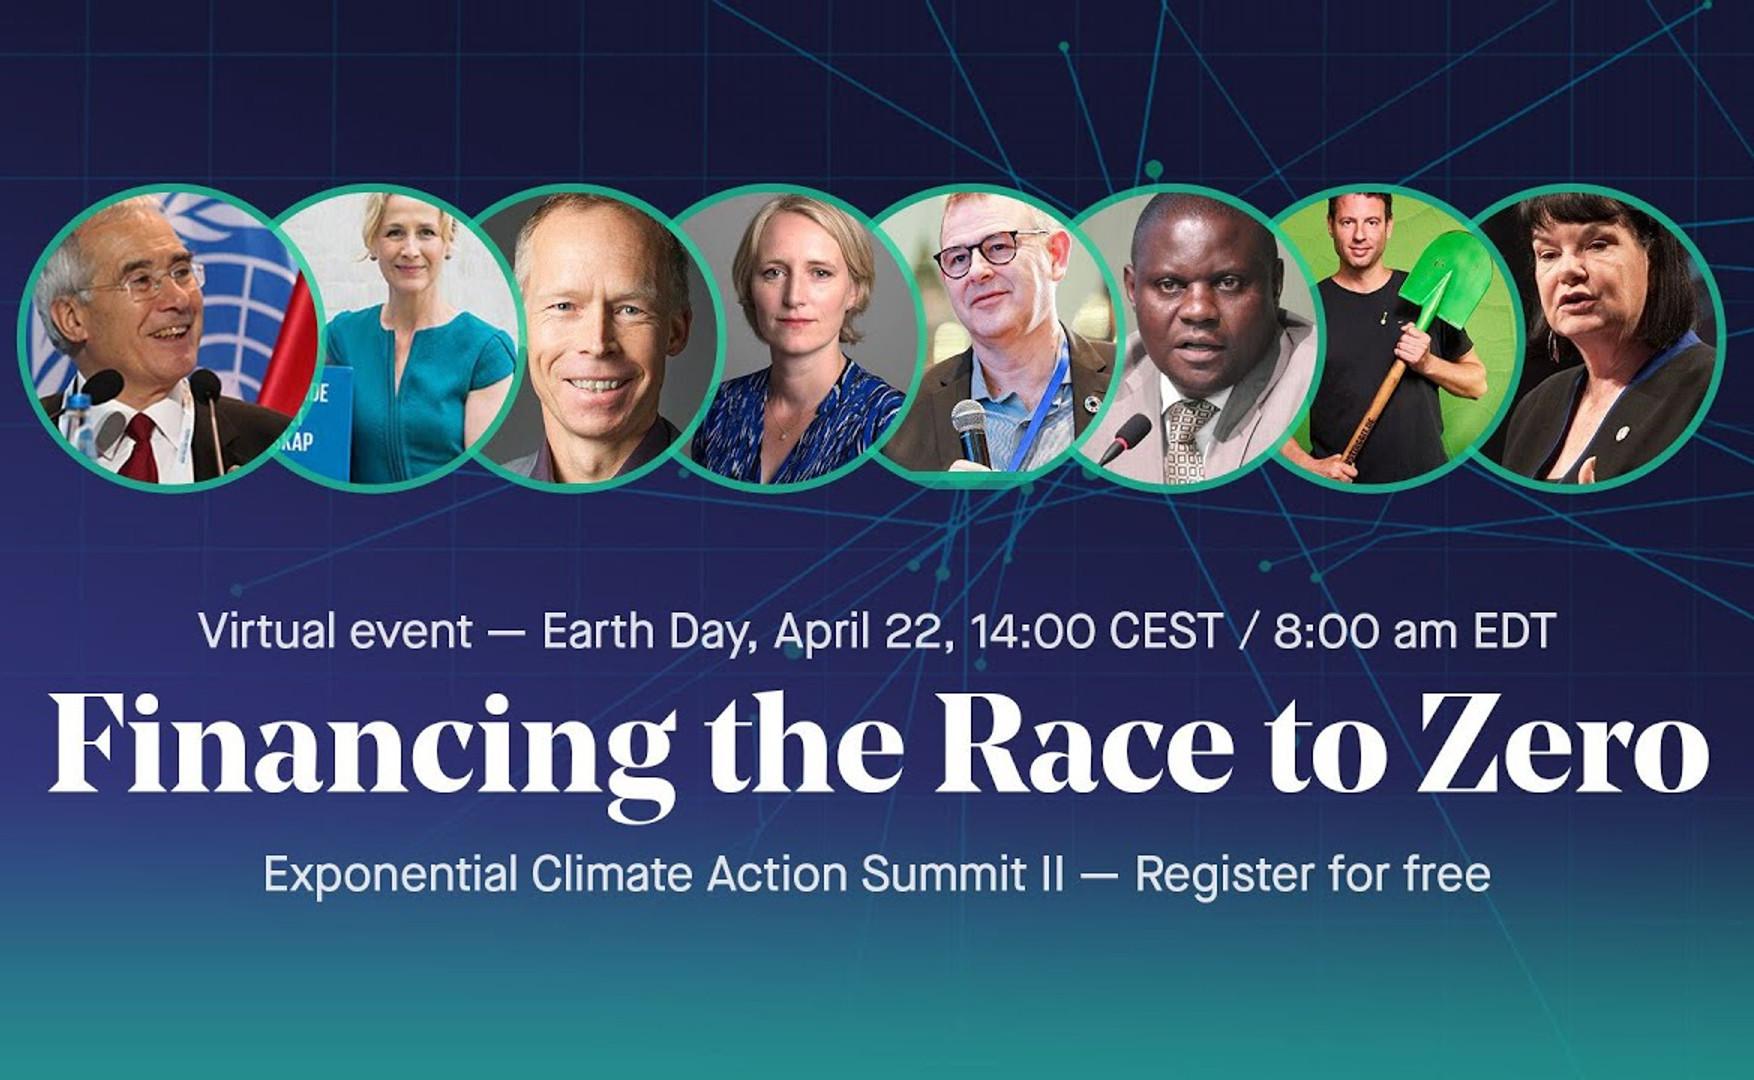 Financing the Race to Zero